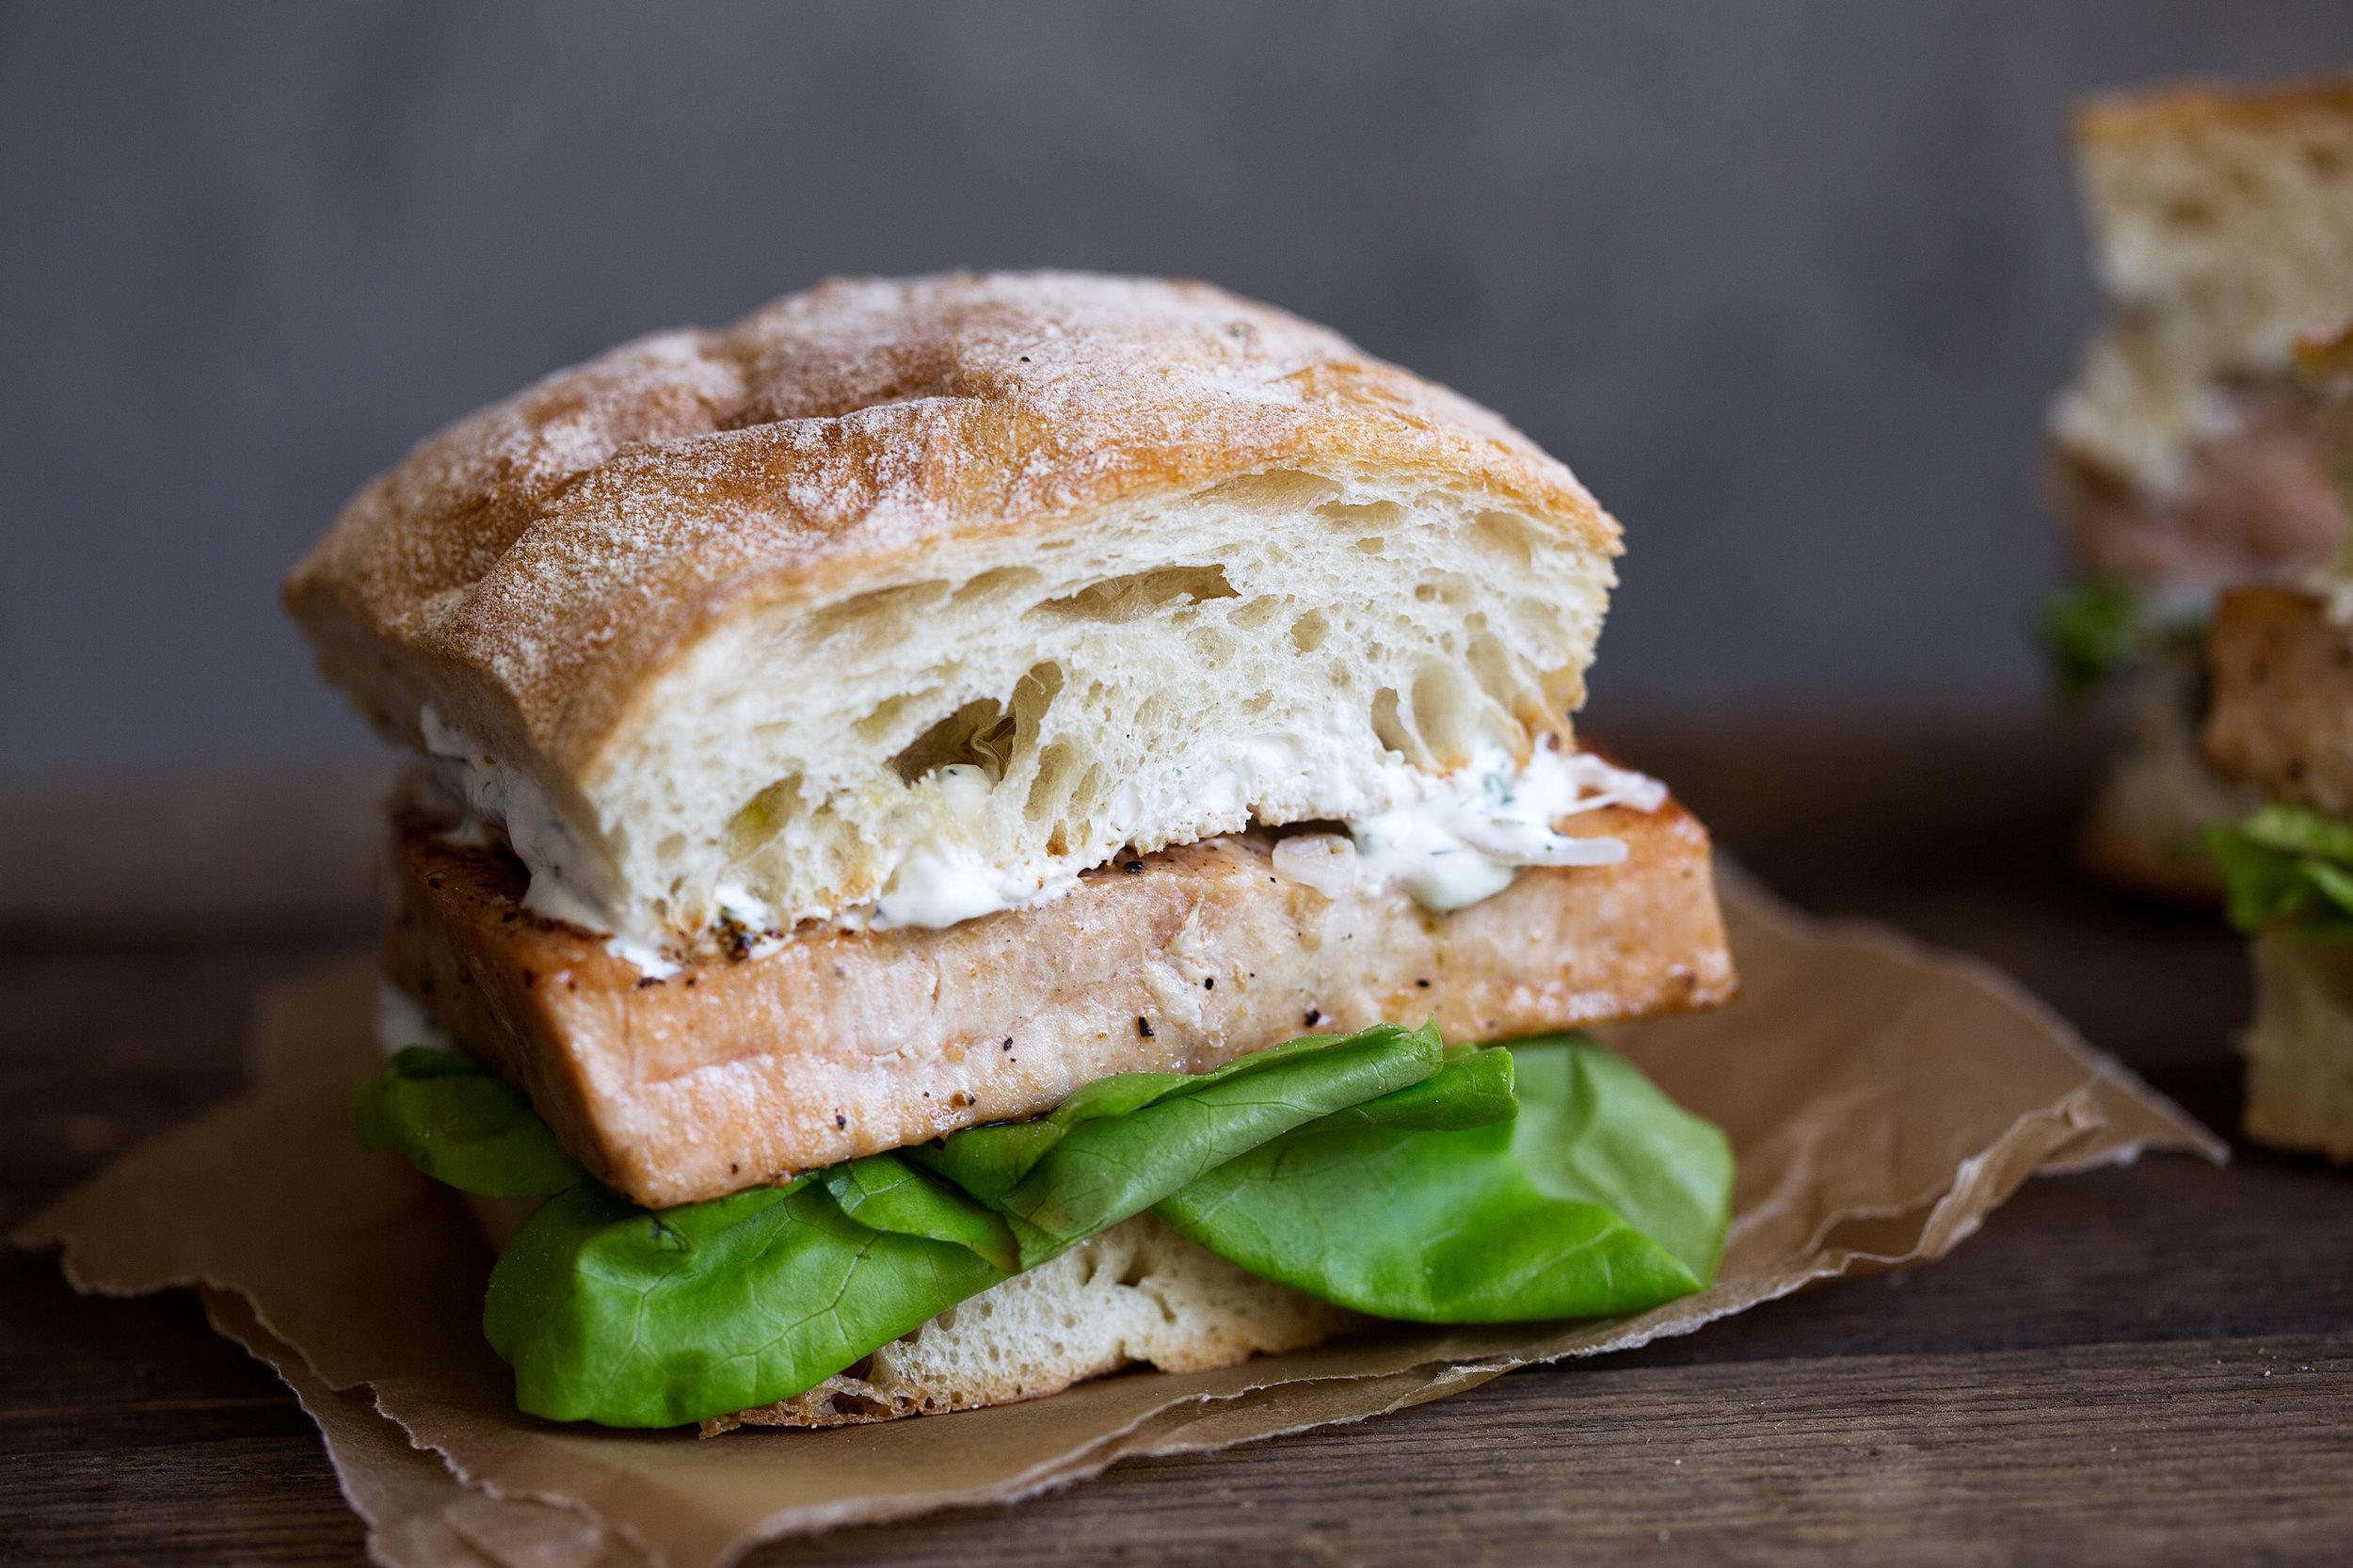 Seared Fish Sandwich with Tarragon Yogurt Sauce and Pickled